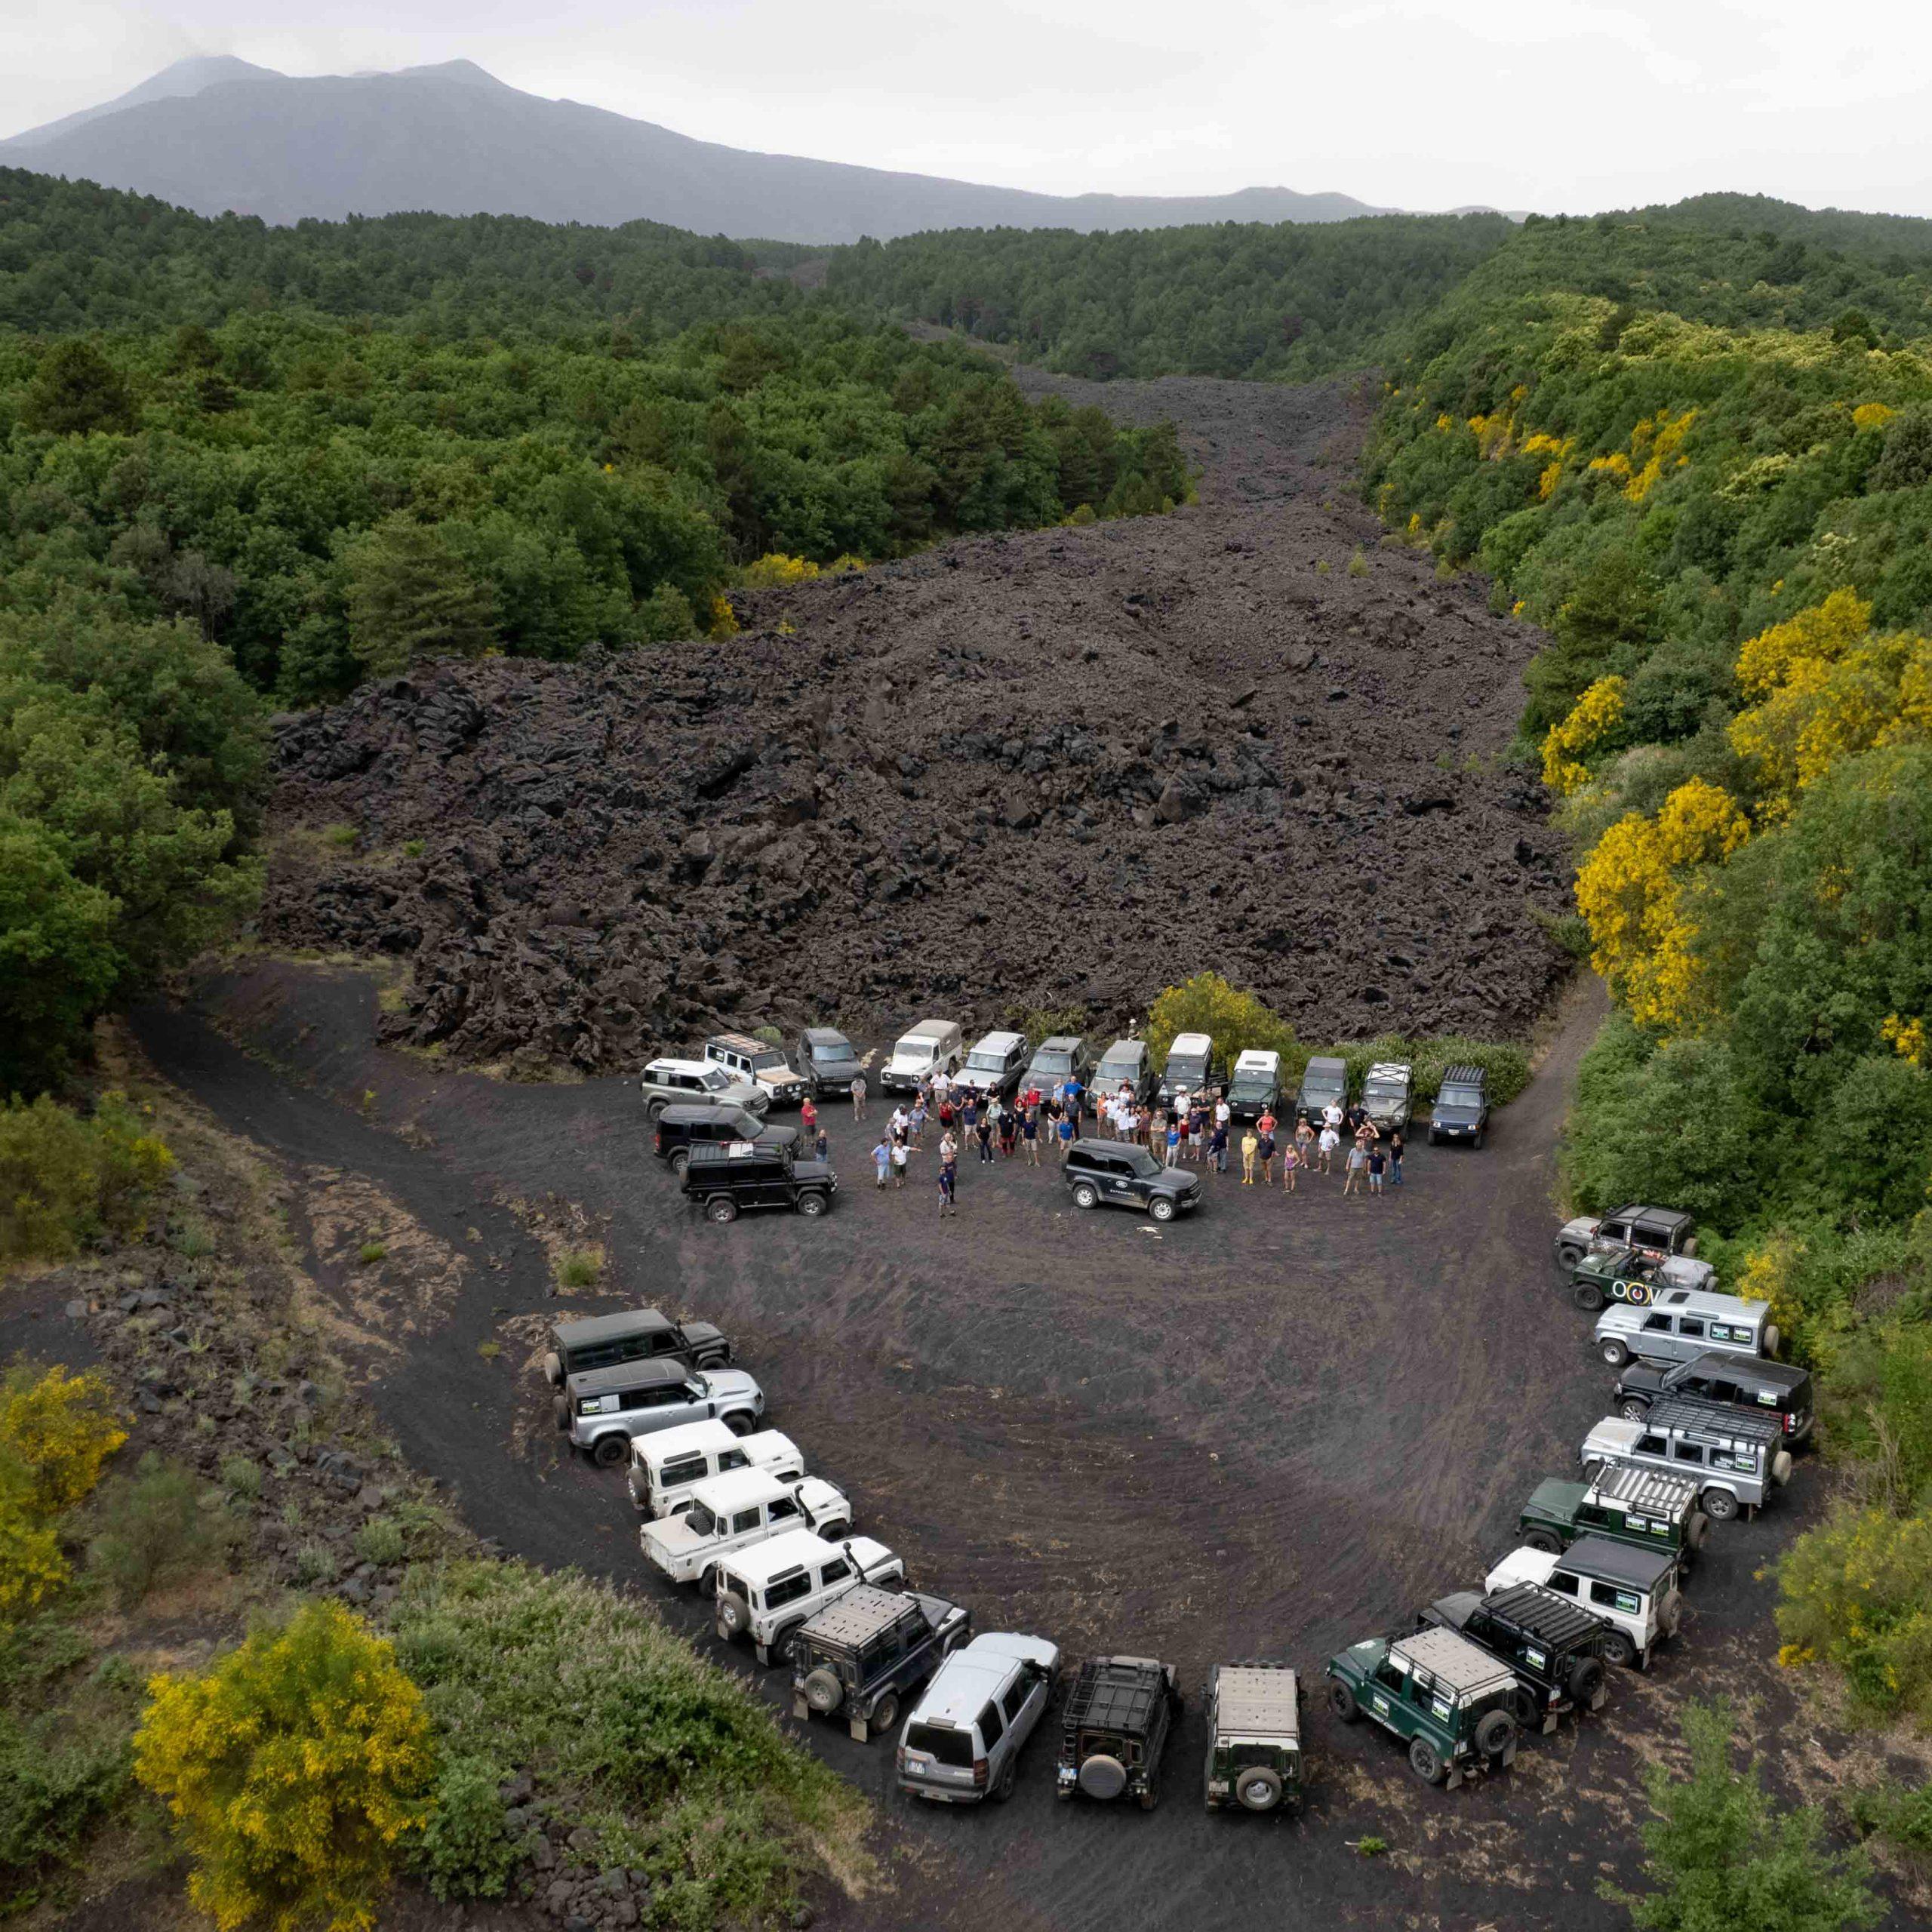 Land_Rover_Tour_Sicilia_2021_Land_Rover_Experience_Italia_-122